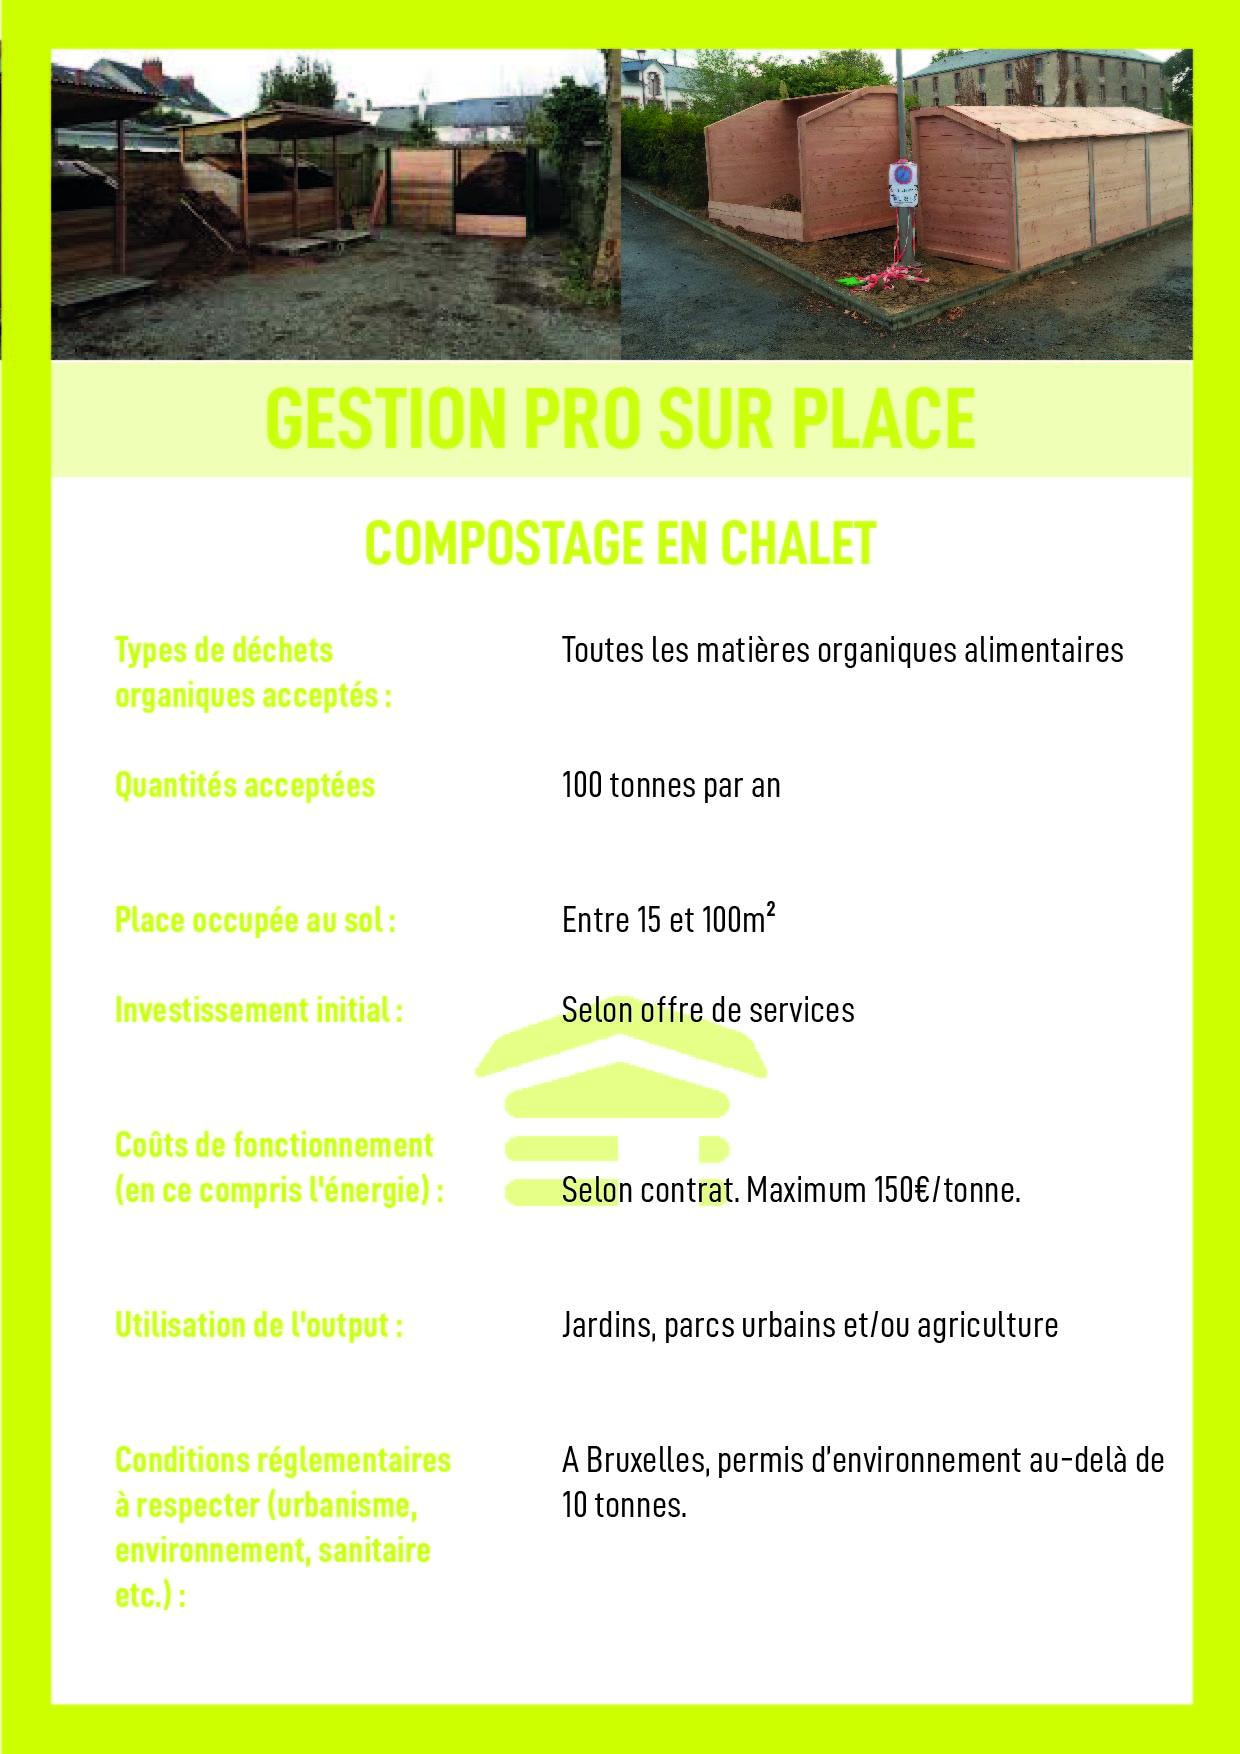 chalet test-02-01.jpg